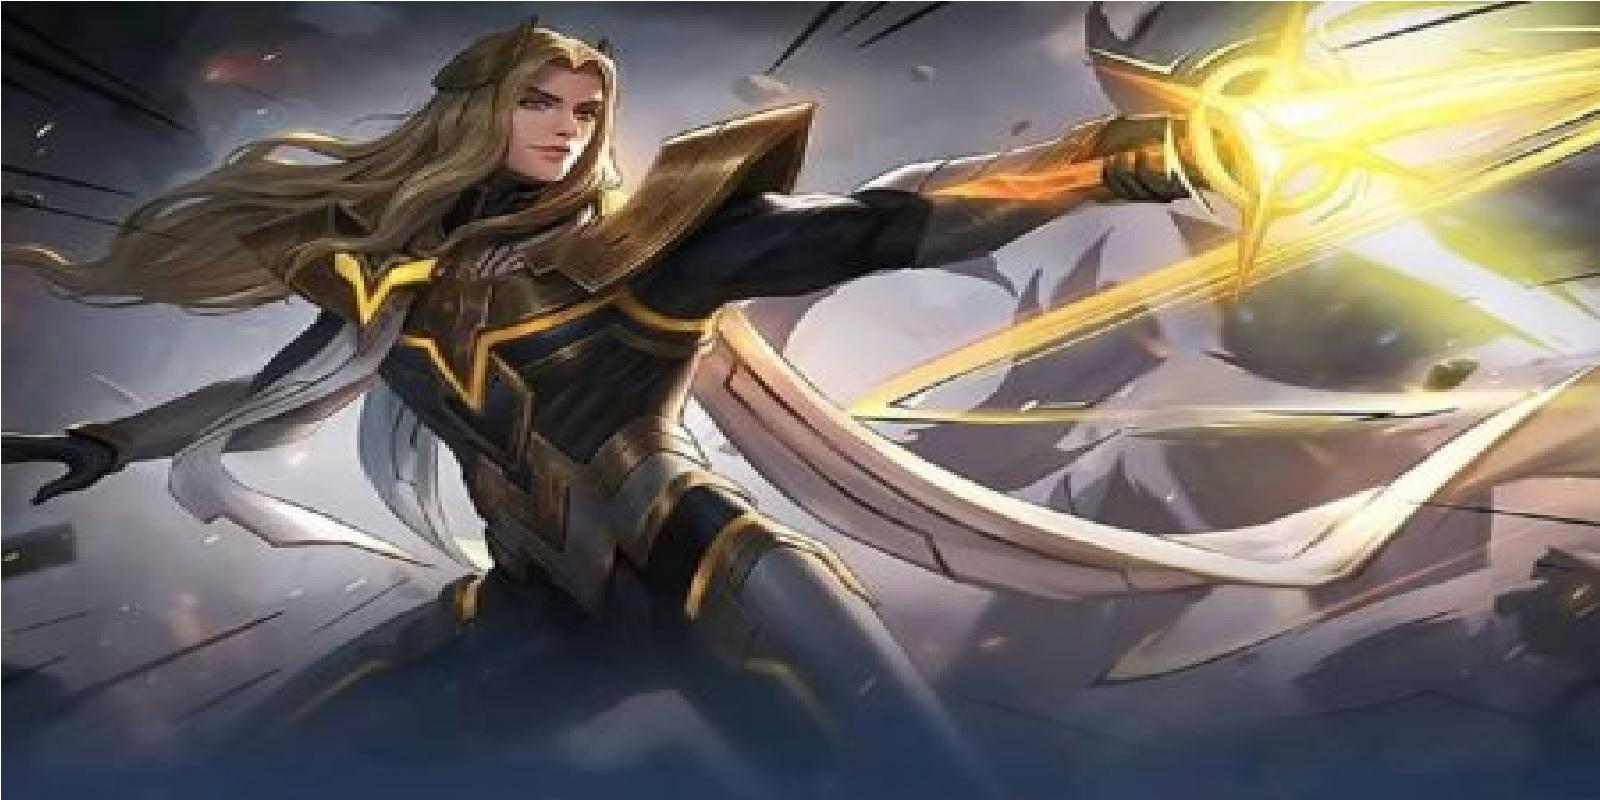 Release Date The Legends Of Sword Event Mobile Legends Ml Esportsku Enjoy~ #mobilelegends #mlbb #mobilelegendfyi @mobilelegendswtf @ml_leak… release date the legends of sword event